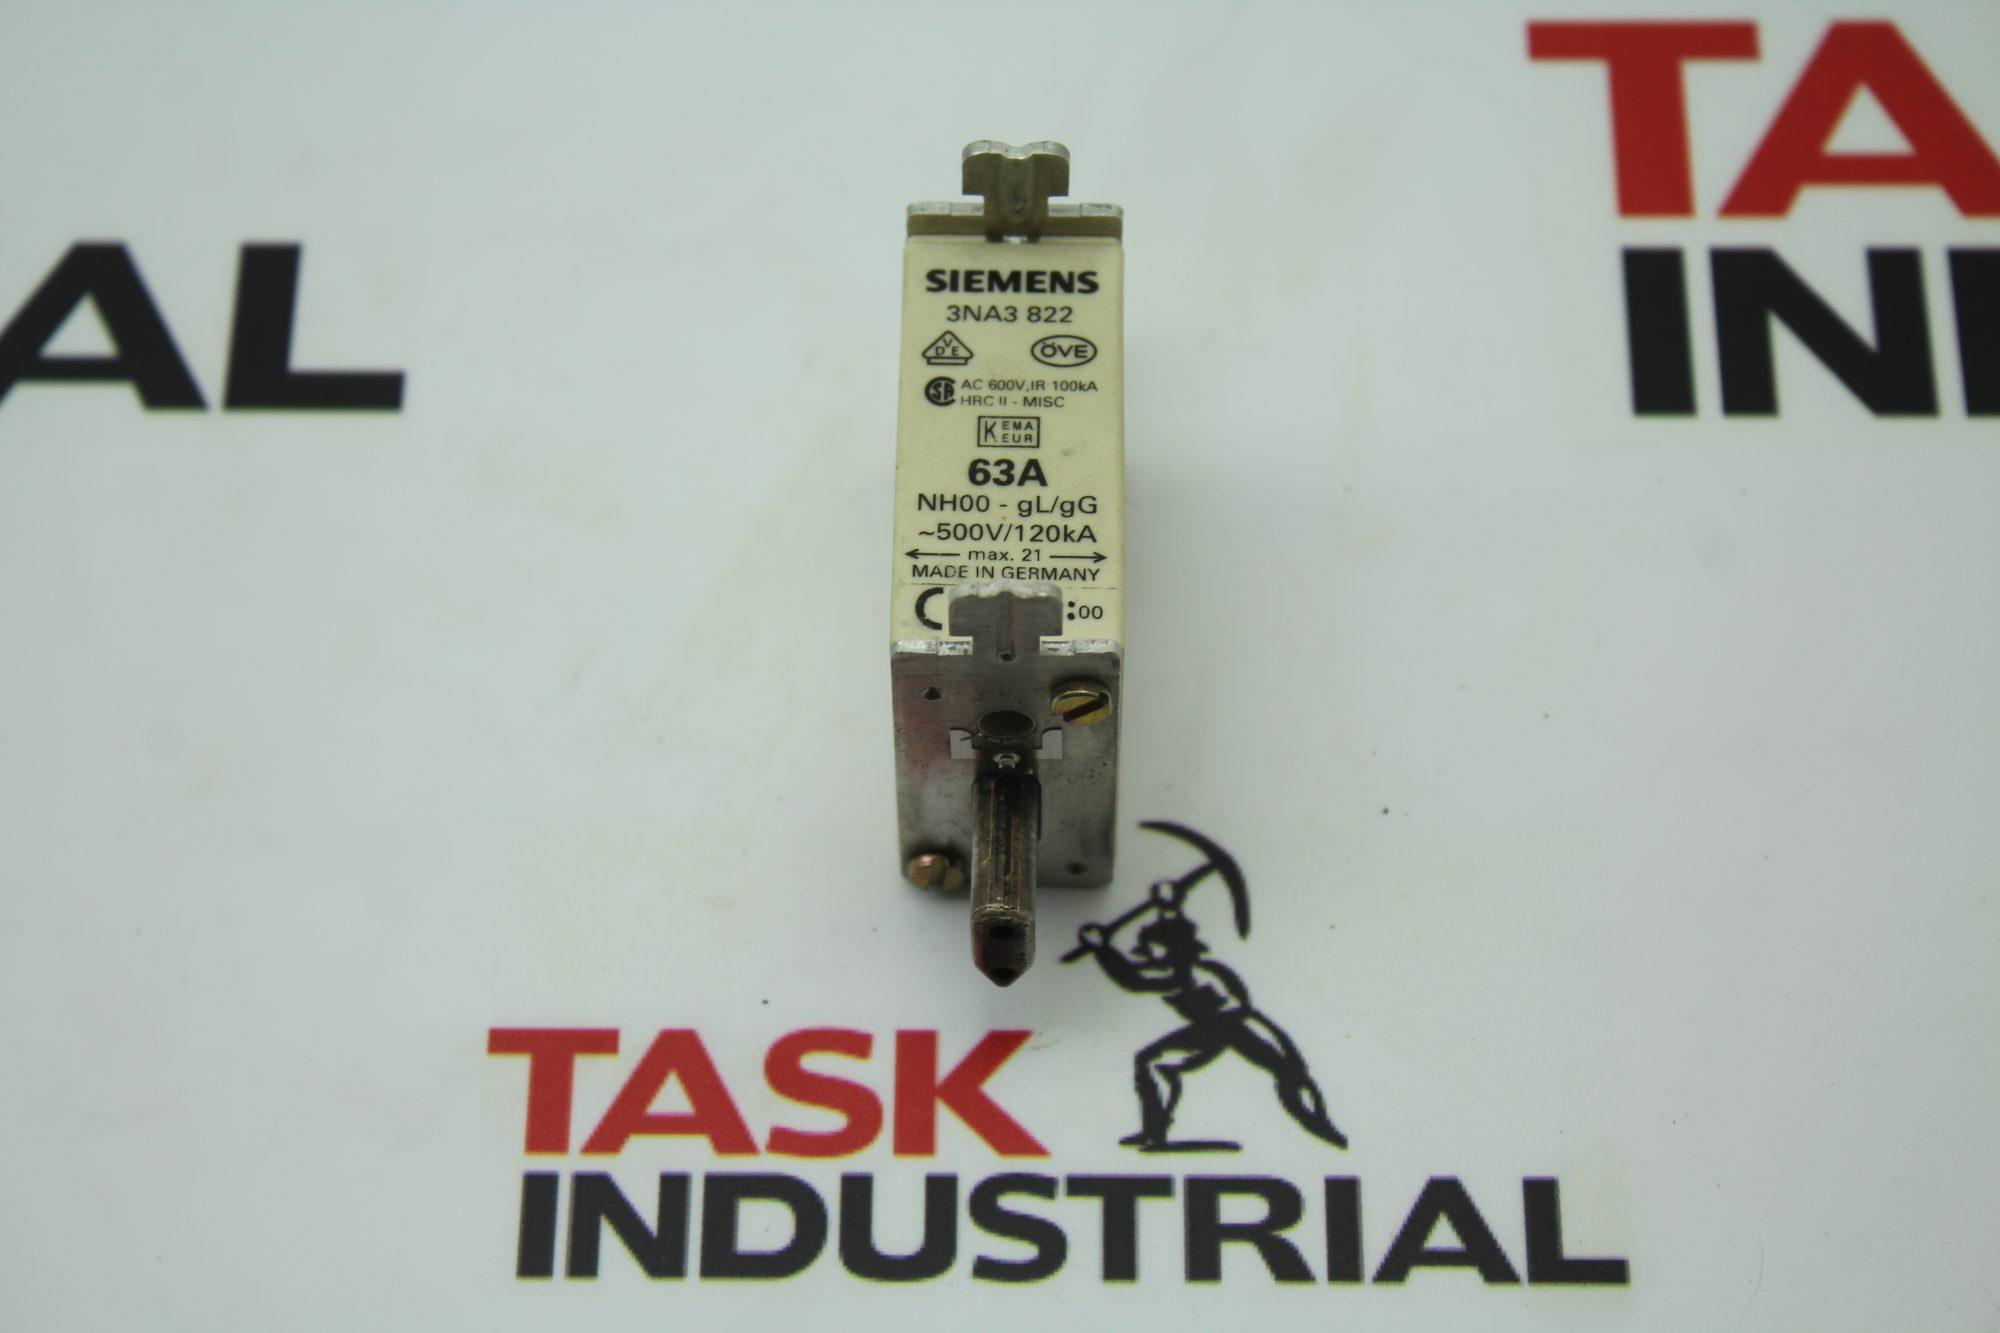 Siemens 3NA3 822 Fuse Link 63A